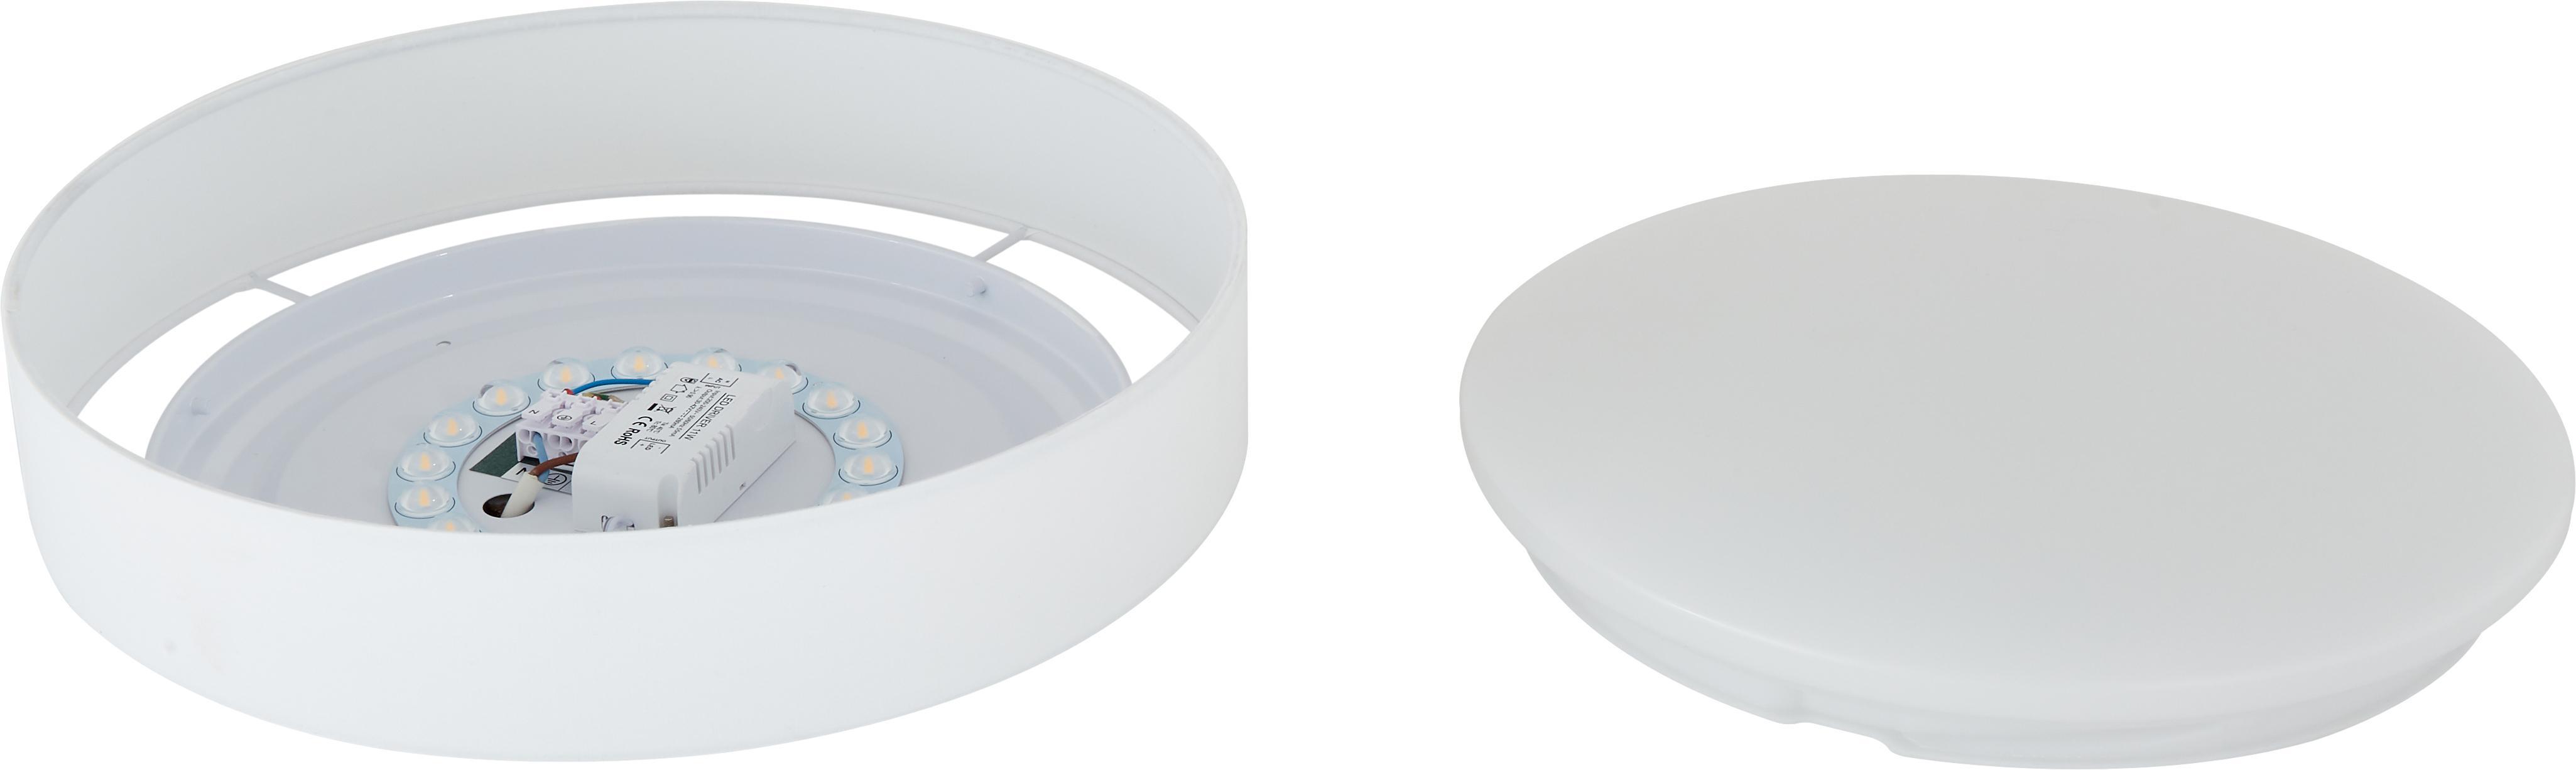 LED-Deckenleuchte Helen, Rahmen: Metall, Diffusorscheibe: Kunststoff, Weiss, Ø 35 x H 7 cm